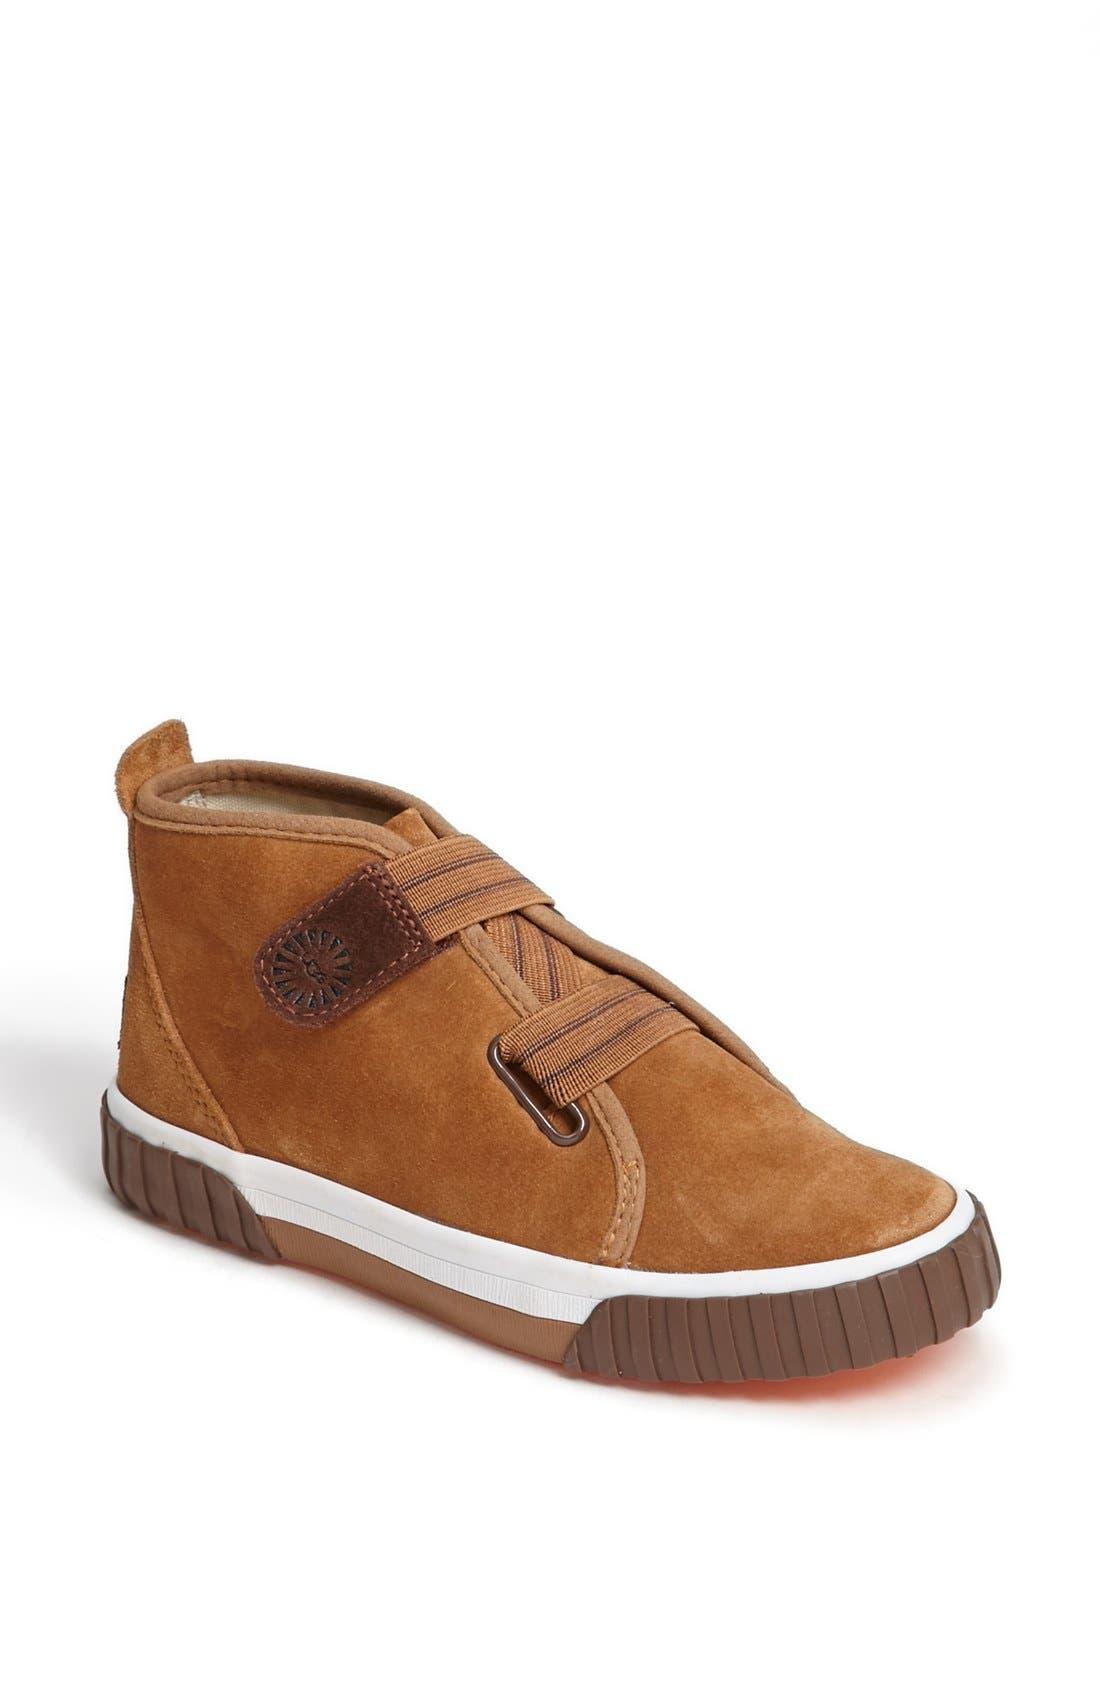 Alternate Image 1 Selected - UGG® Australia 'Mycah' Sneaker (Toddler, Little Kid & Big Kid)